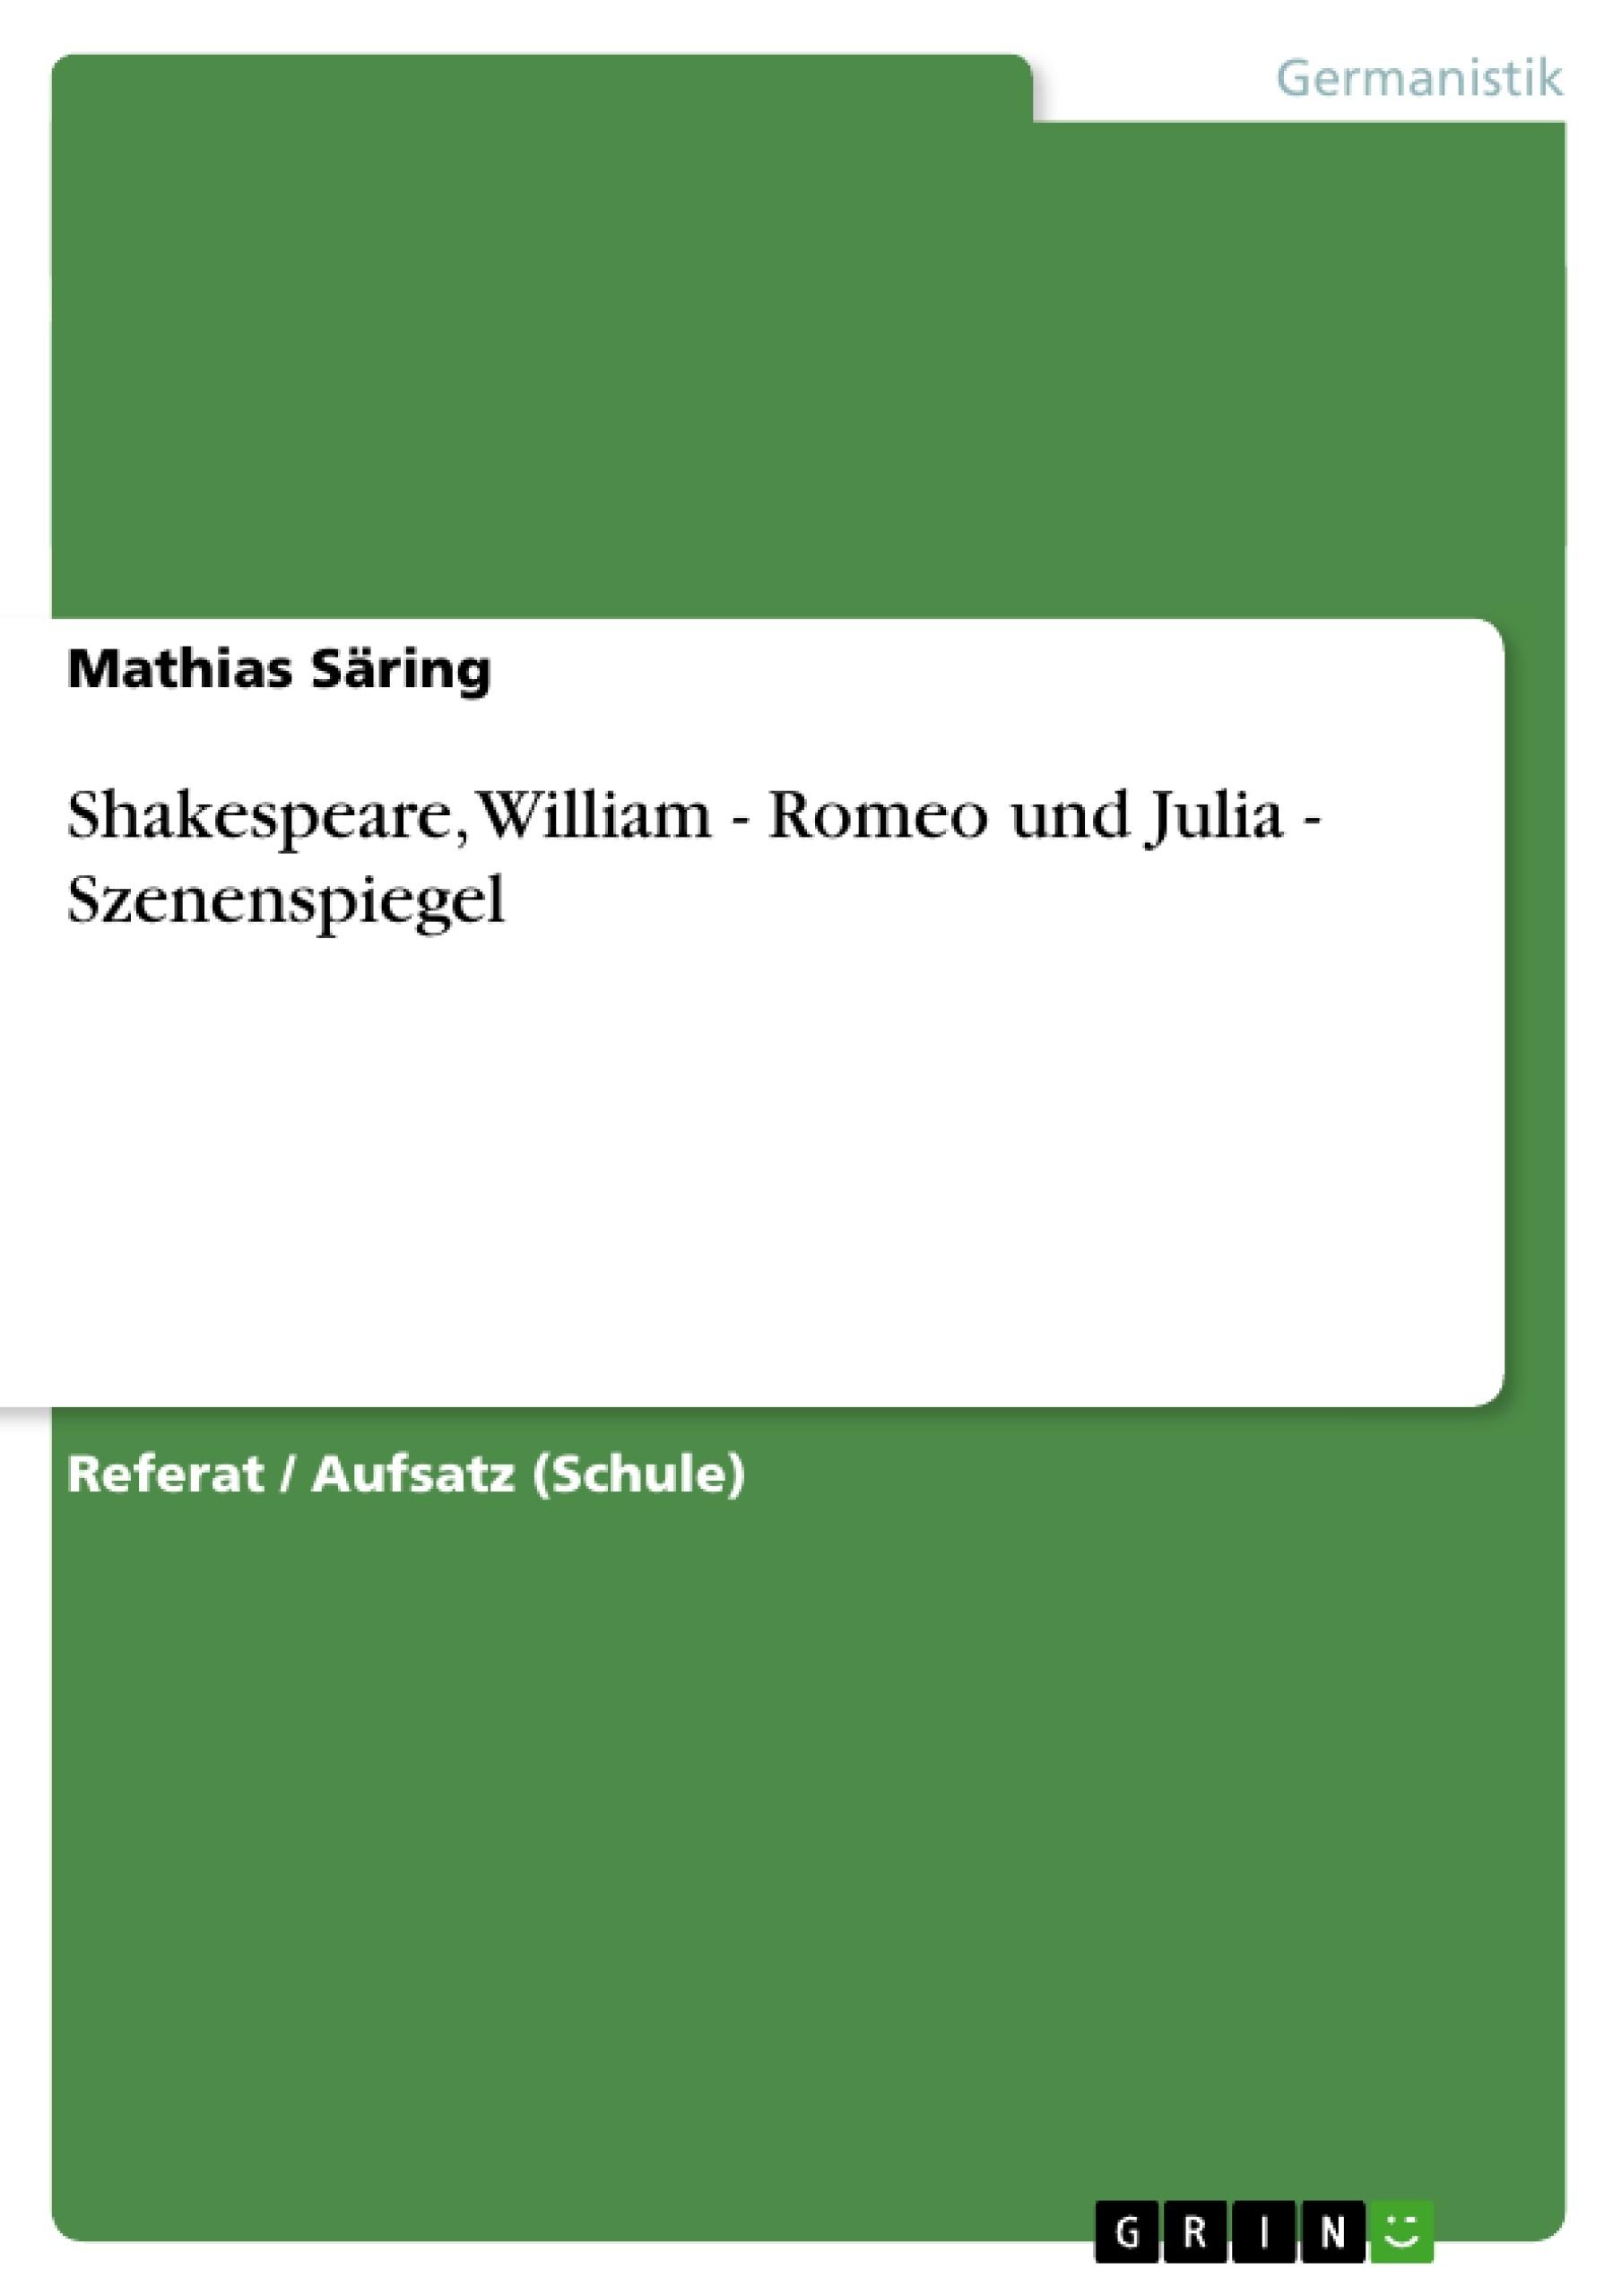 Titel: Shakespeare, William - Romeo und Julia - Szenenspiegel